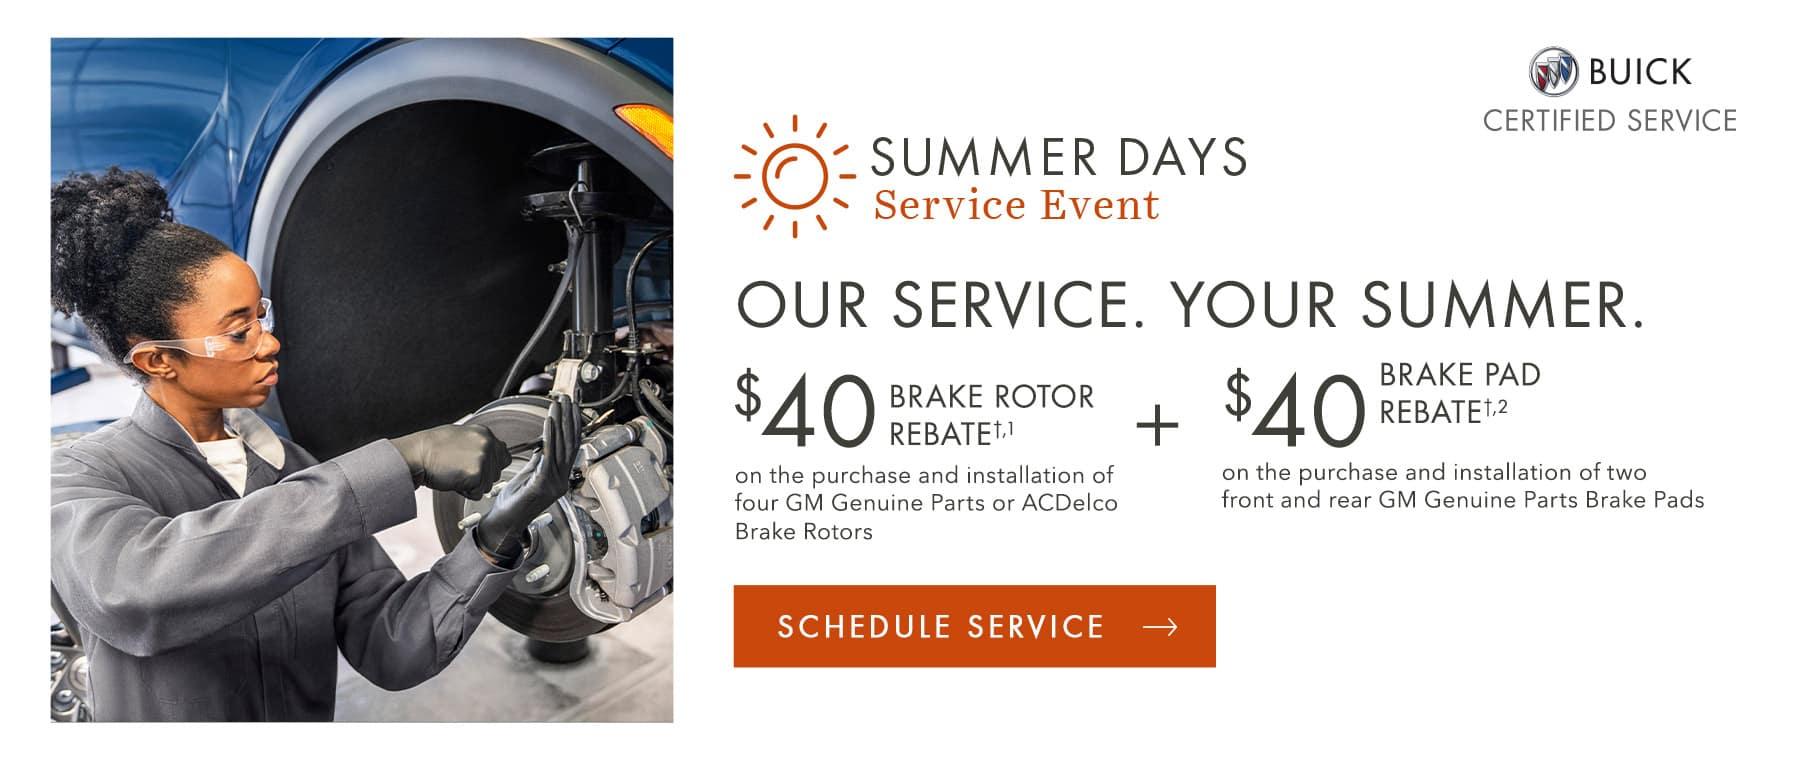 Summer Days Service Event. $40 Brake Rotor rebate + $40 Brake Pad Rebate